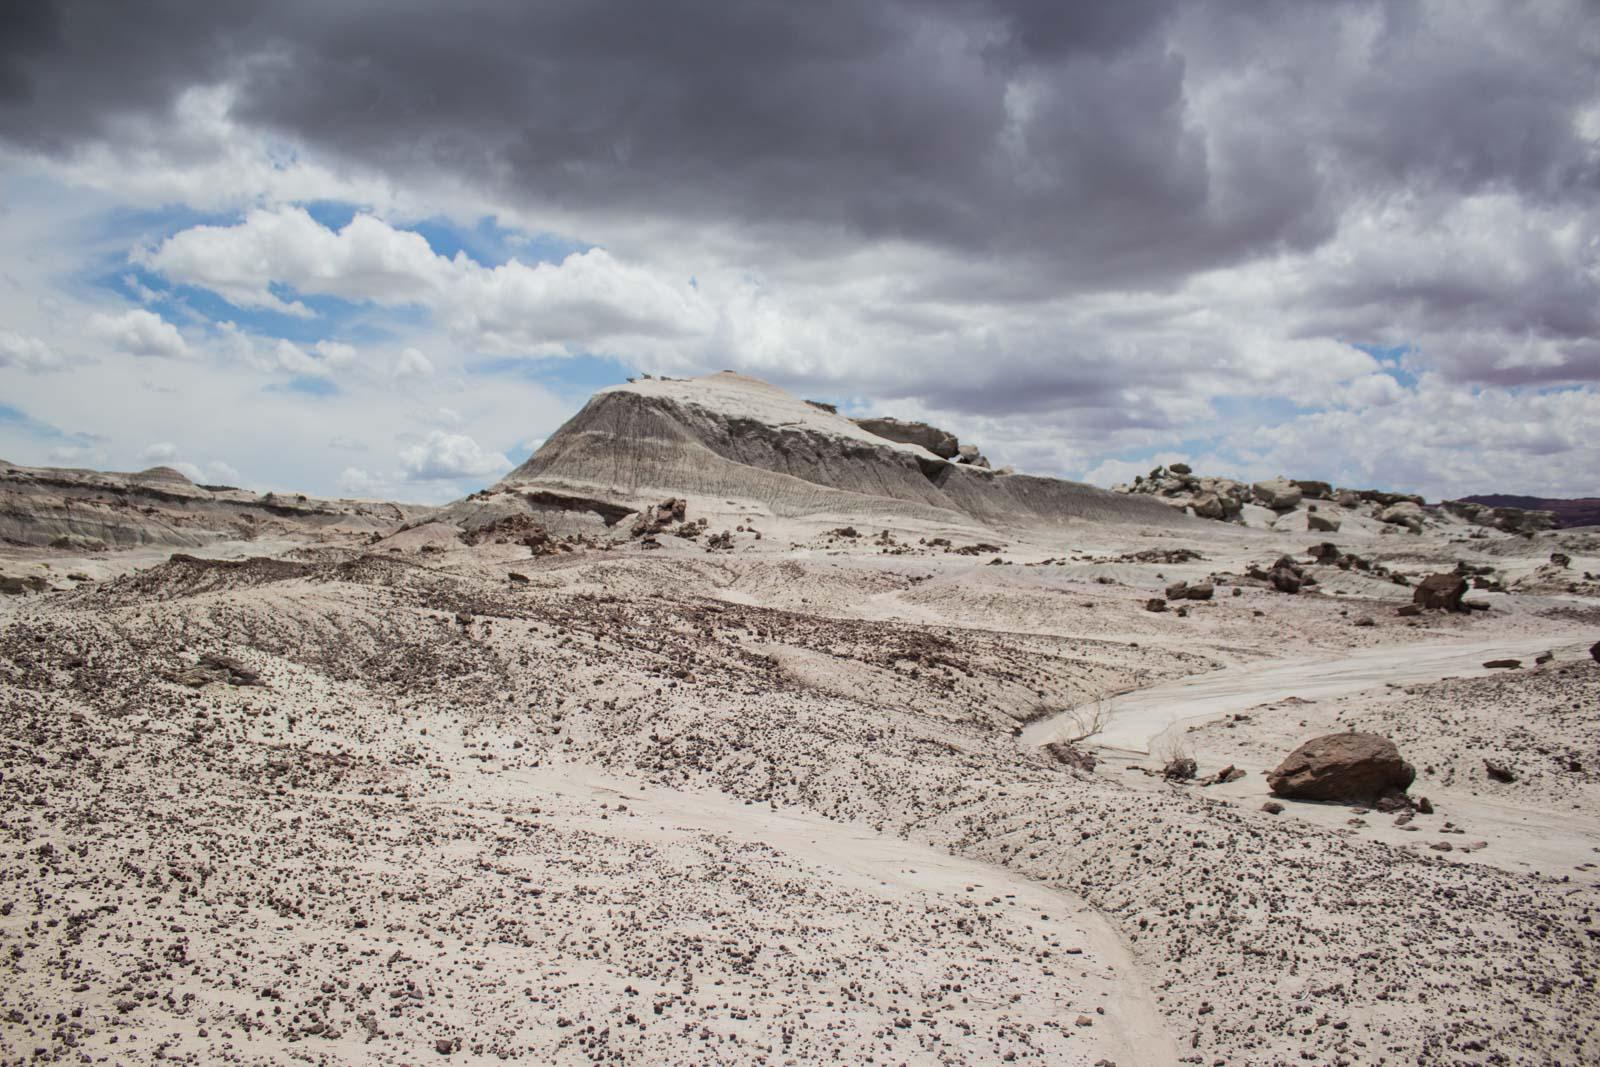 Ischigualasto National Park, Argentina